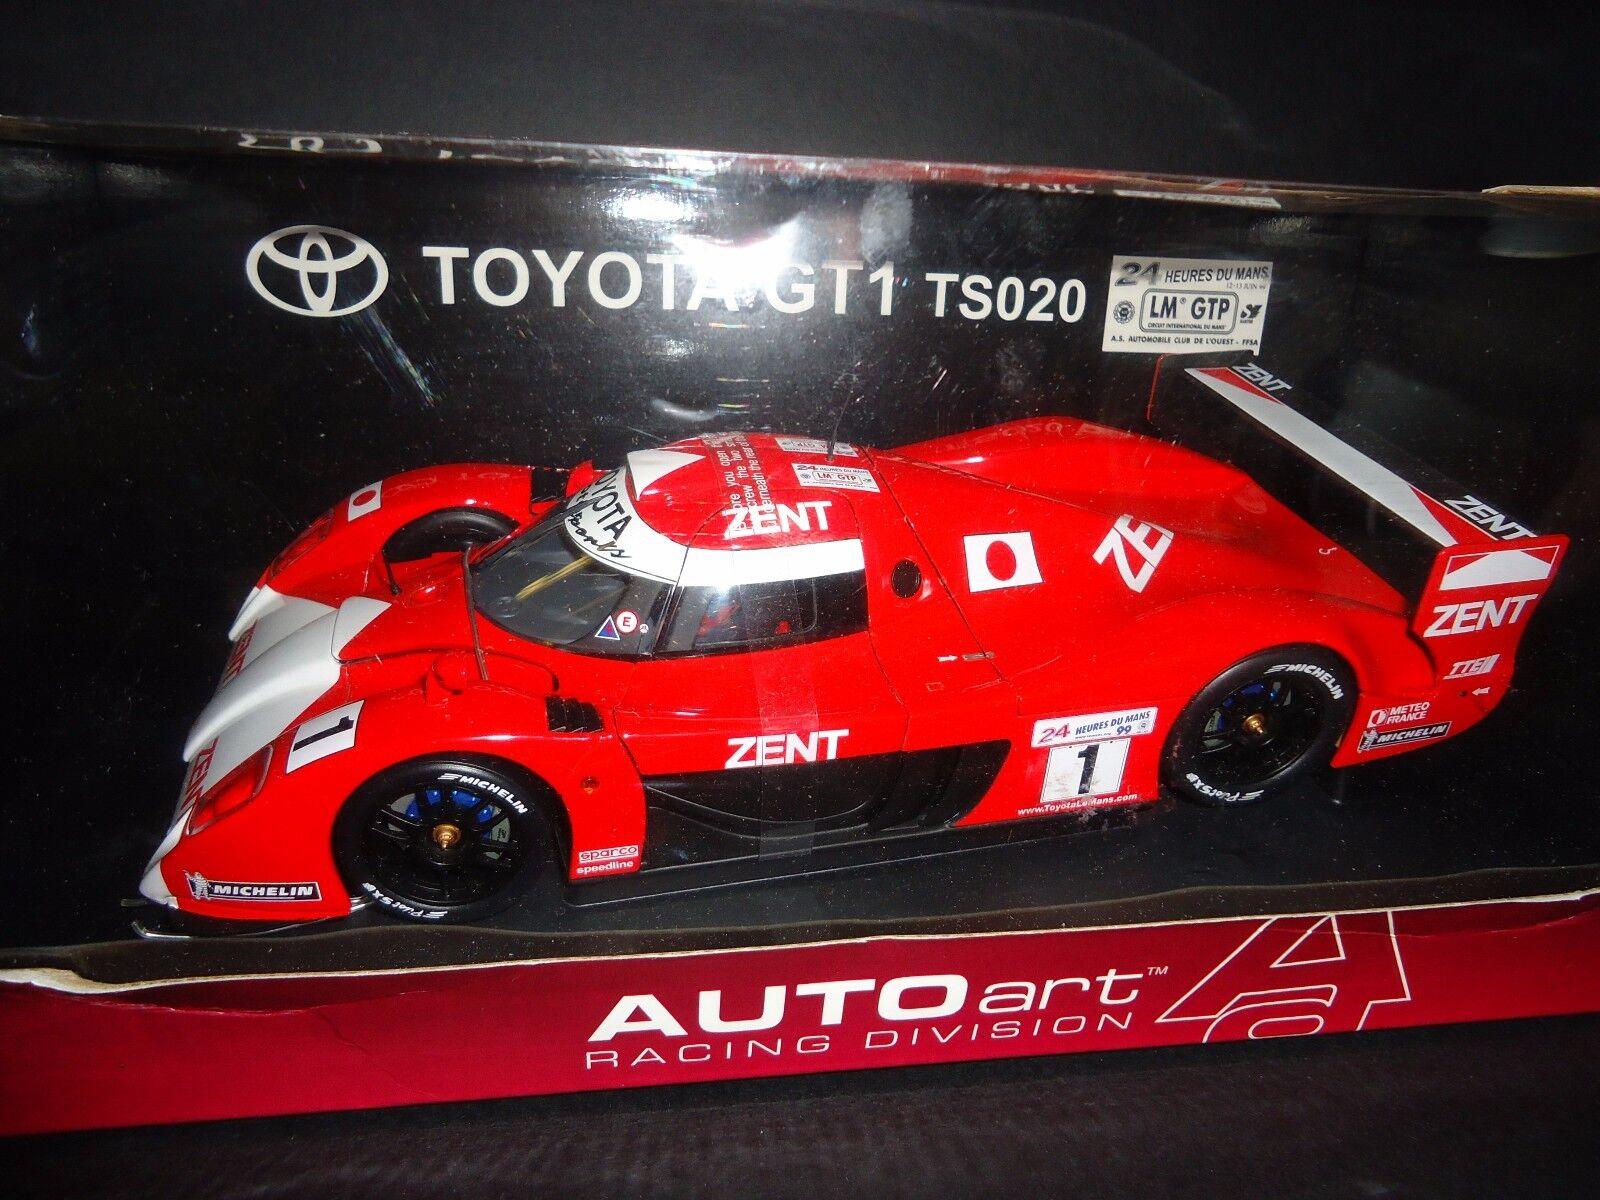 Autoart Toyota GT-1 Le Mans TS020  18 RARE